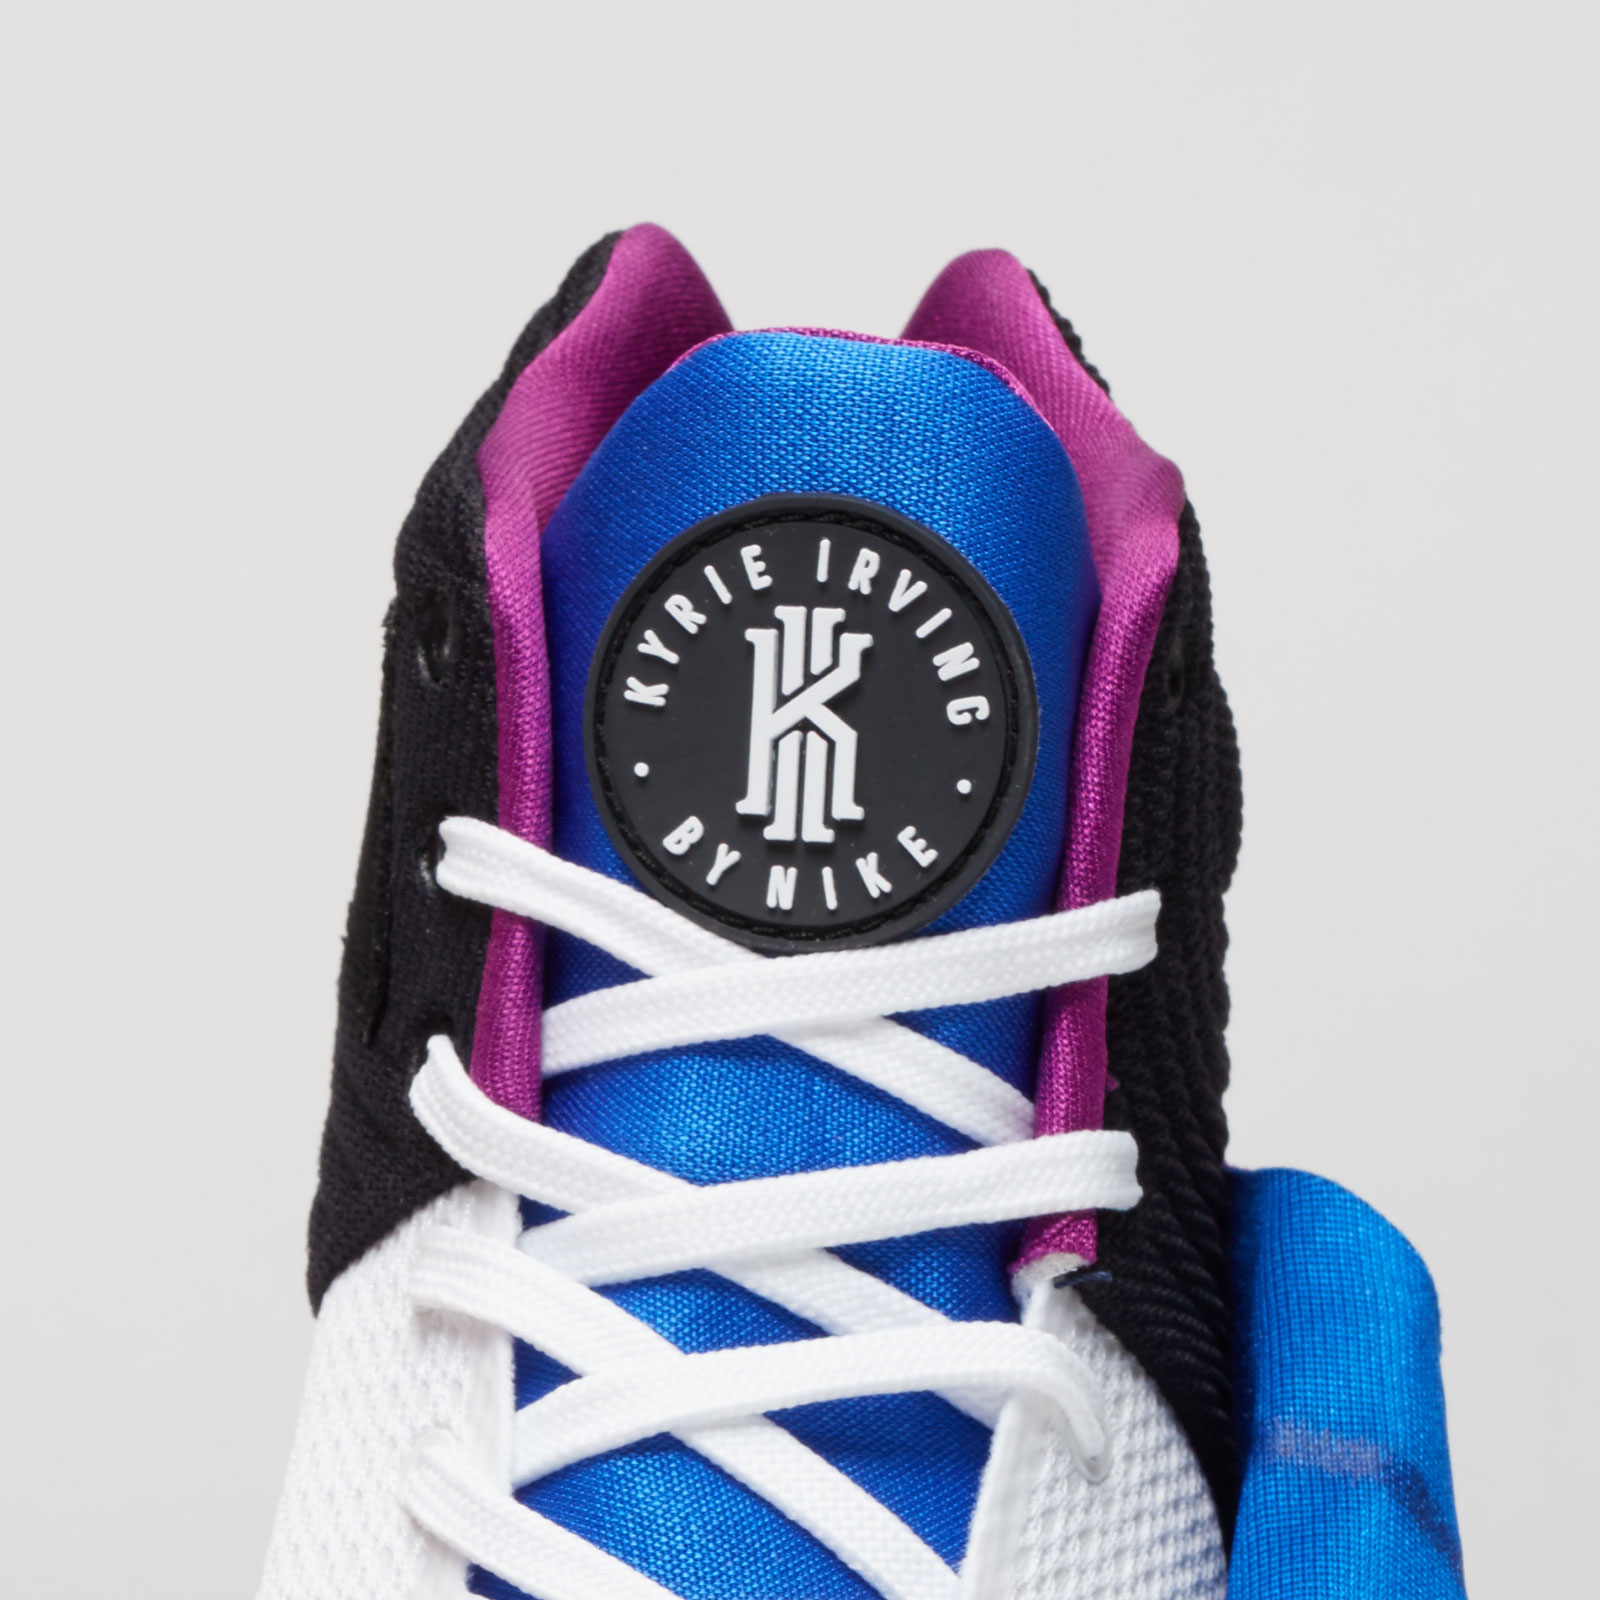 f2910e3500a2 Nike Kyrie 2 - 819583-104 - Sneakersnstuff